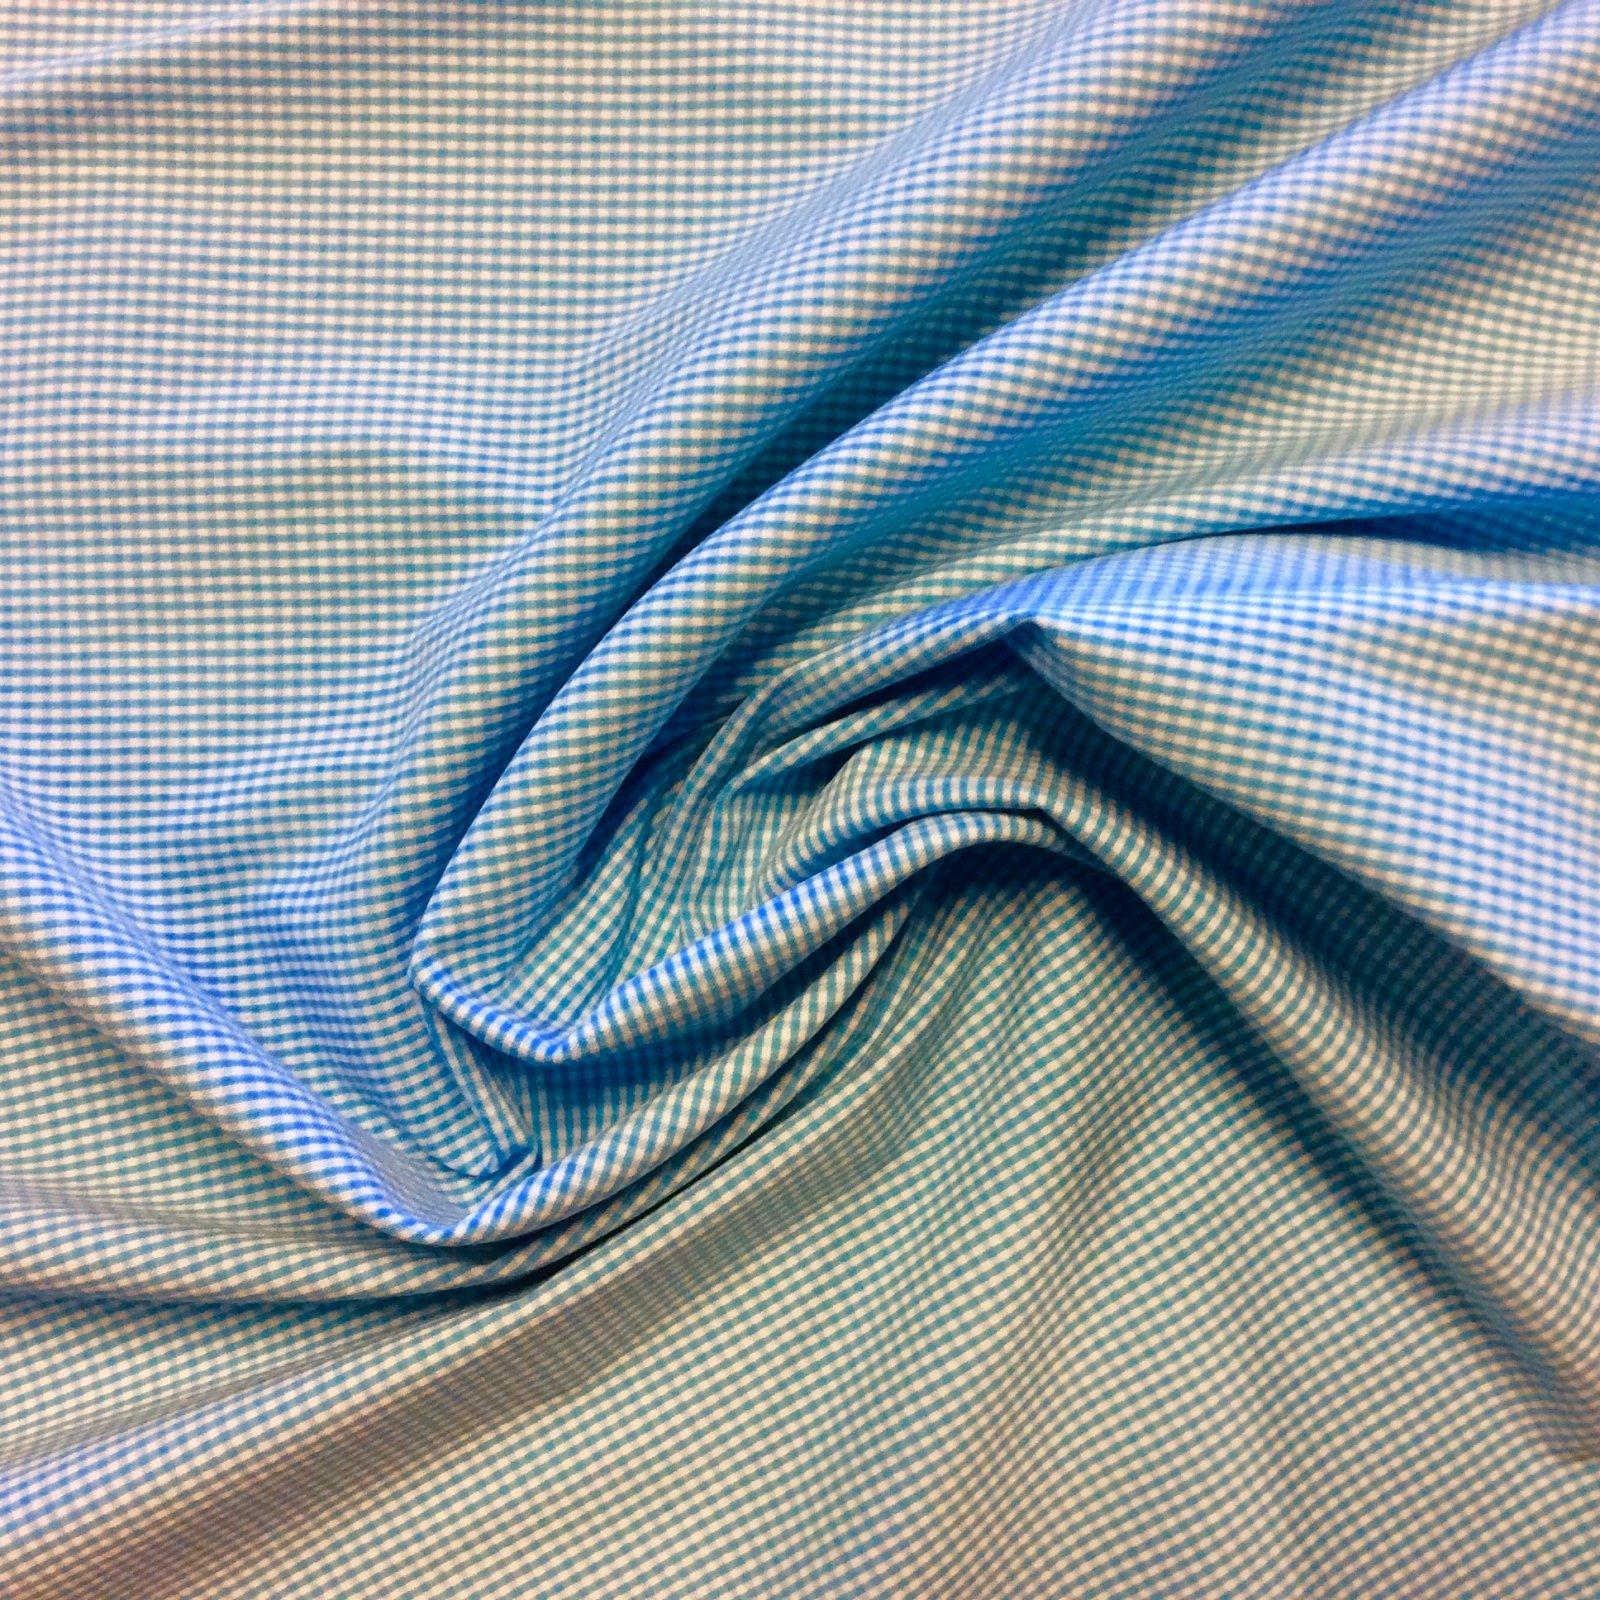 Mini Gingham Blue Aqua and White Polyester Shirting Fabric Stretch Apparel Dress Fabric FMT22